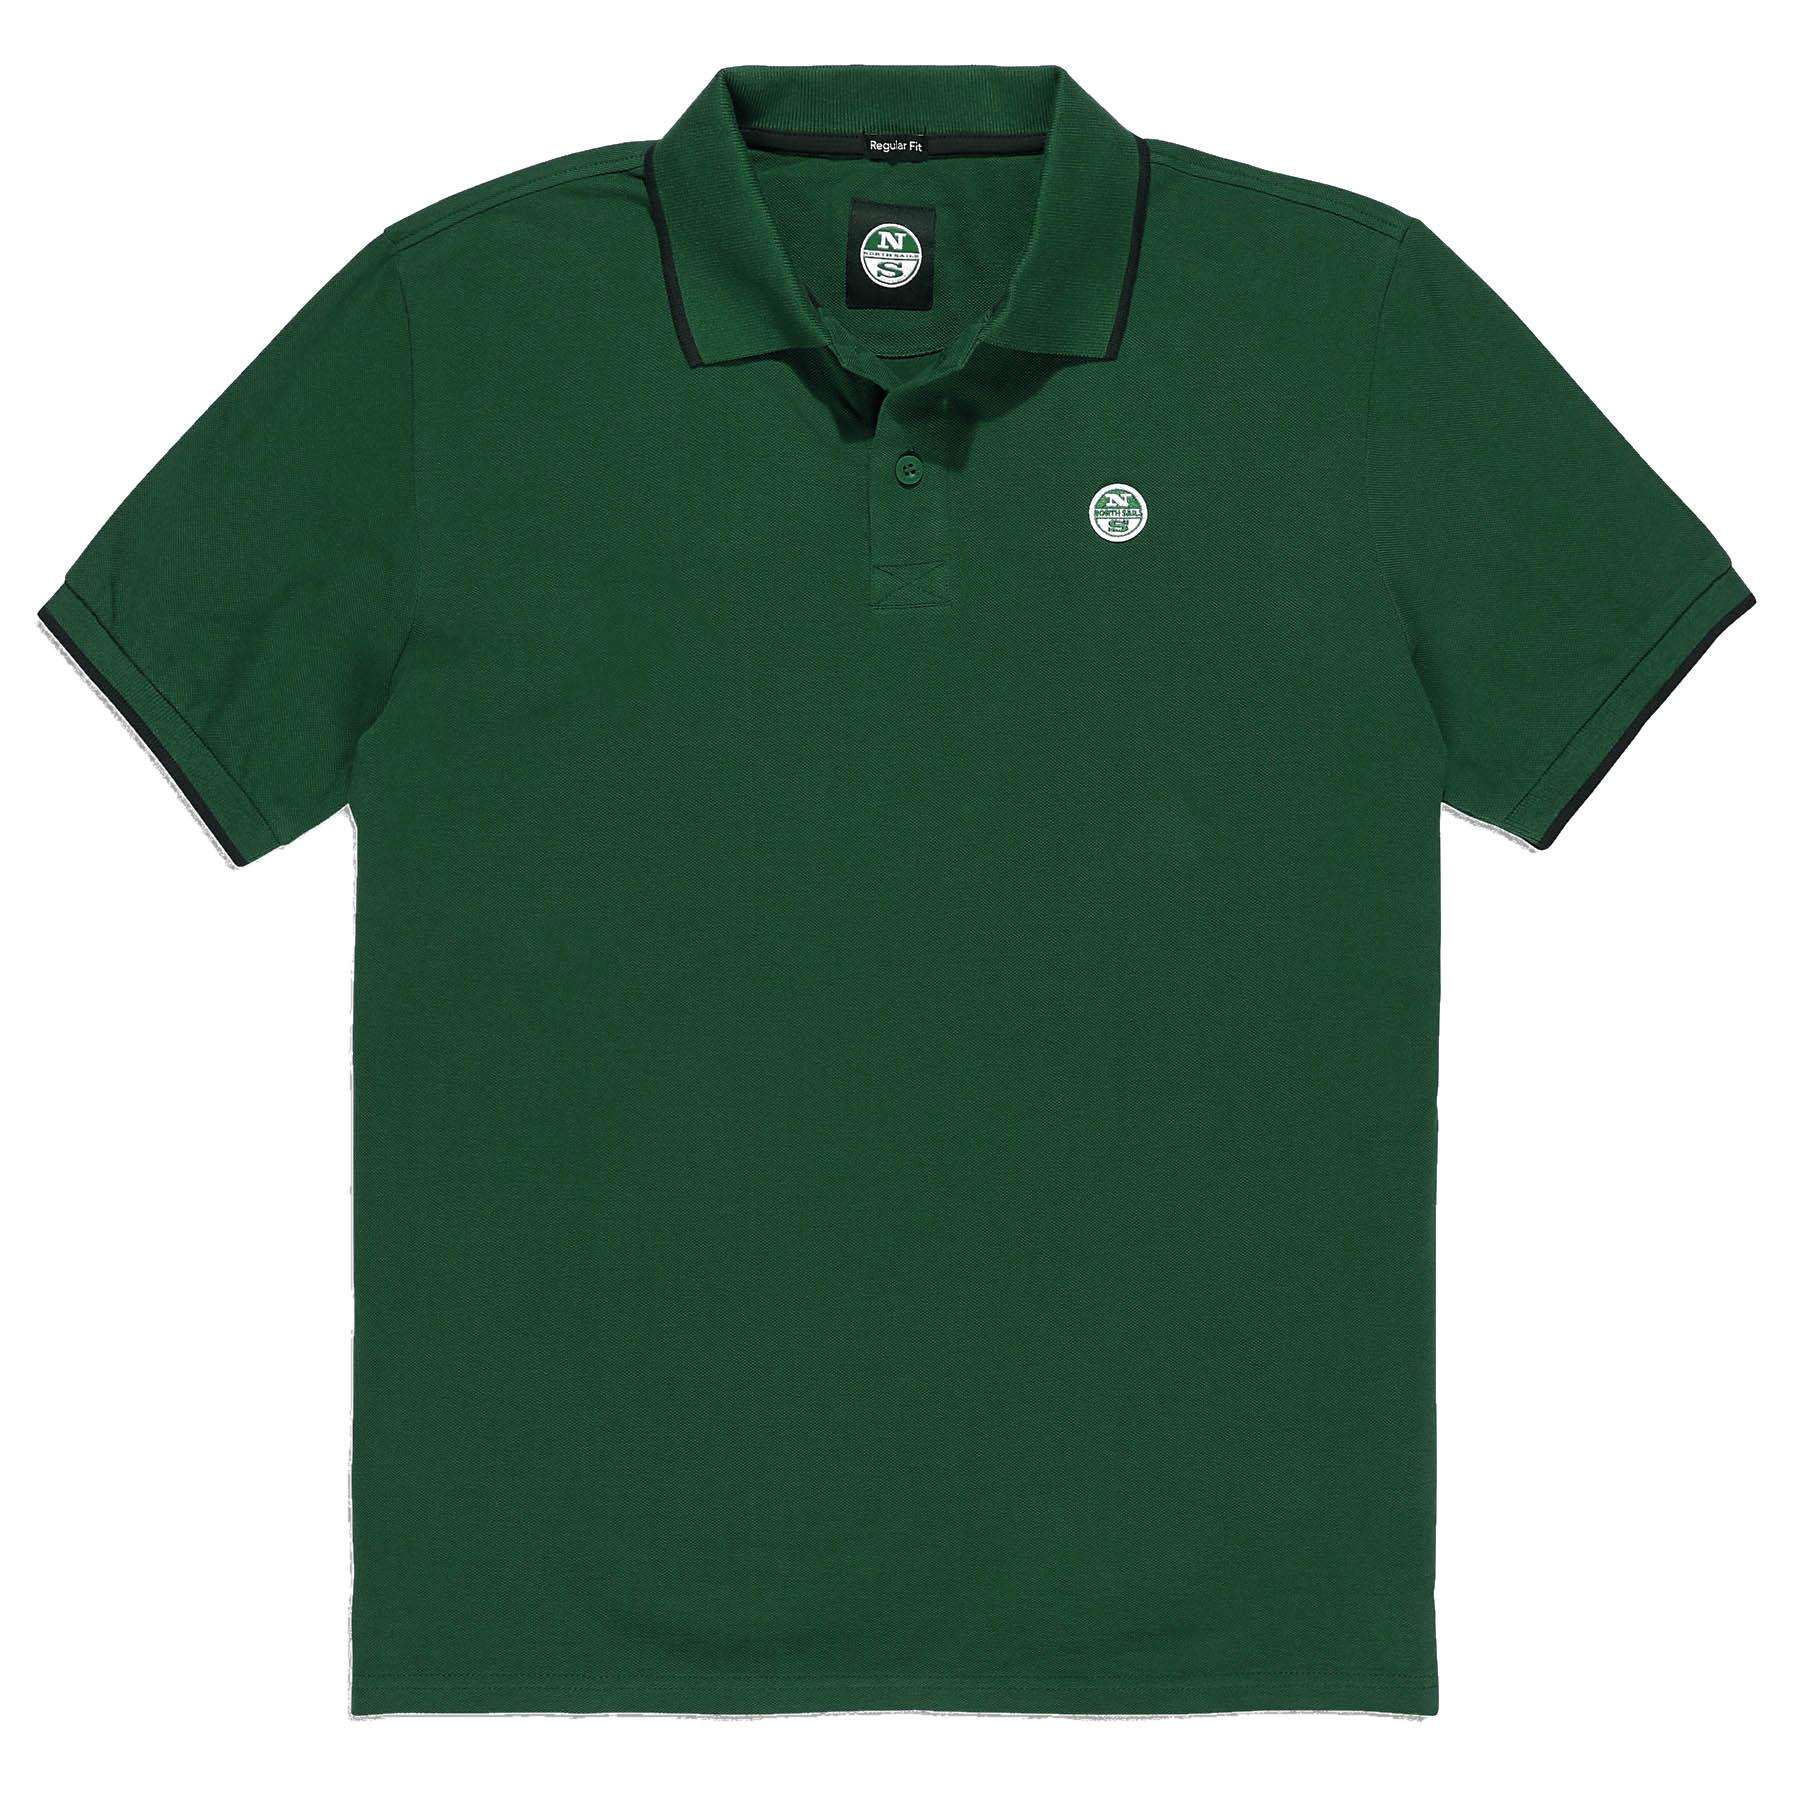 NORTH-SAILS-Mens-Legacy-Heritage-Short-Sleeve-Polo-Shirt-SALE-RRP-50 thumbnail 45